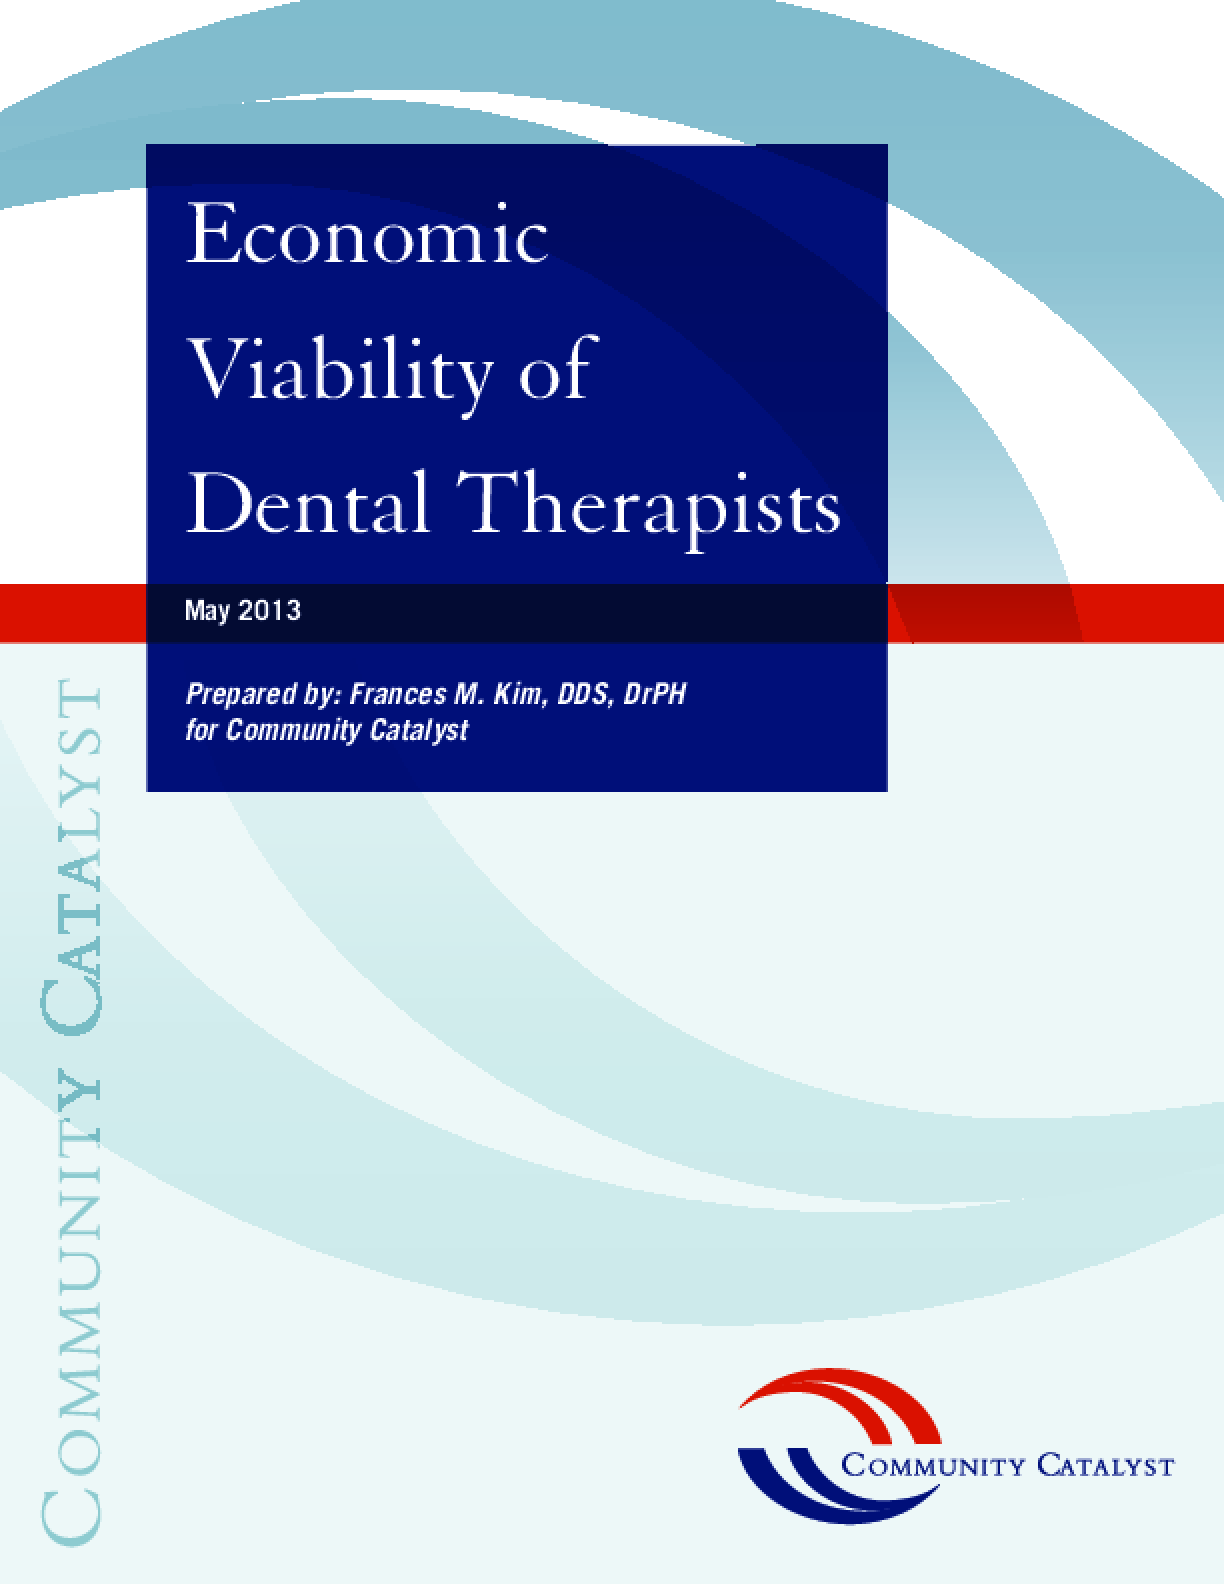 Economic Viability of Dental Therapists